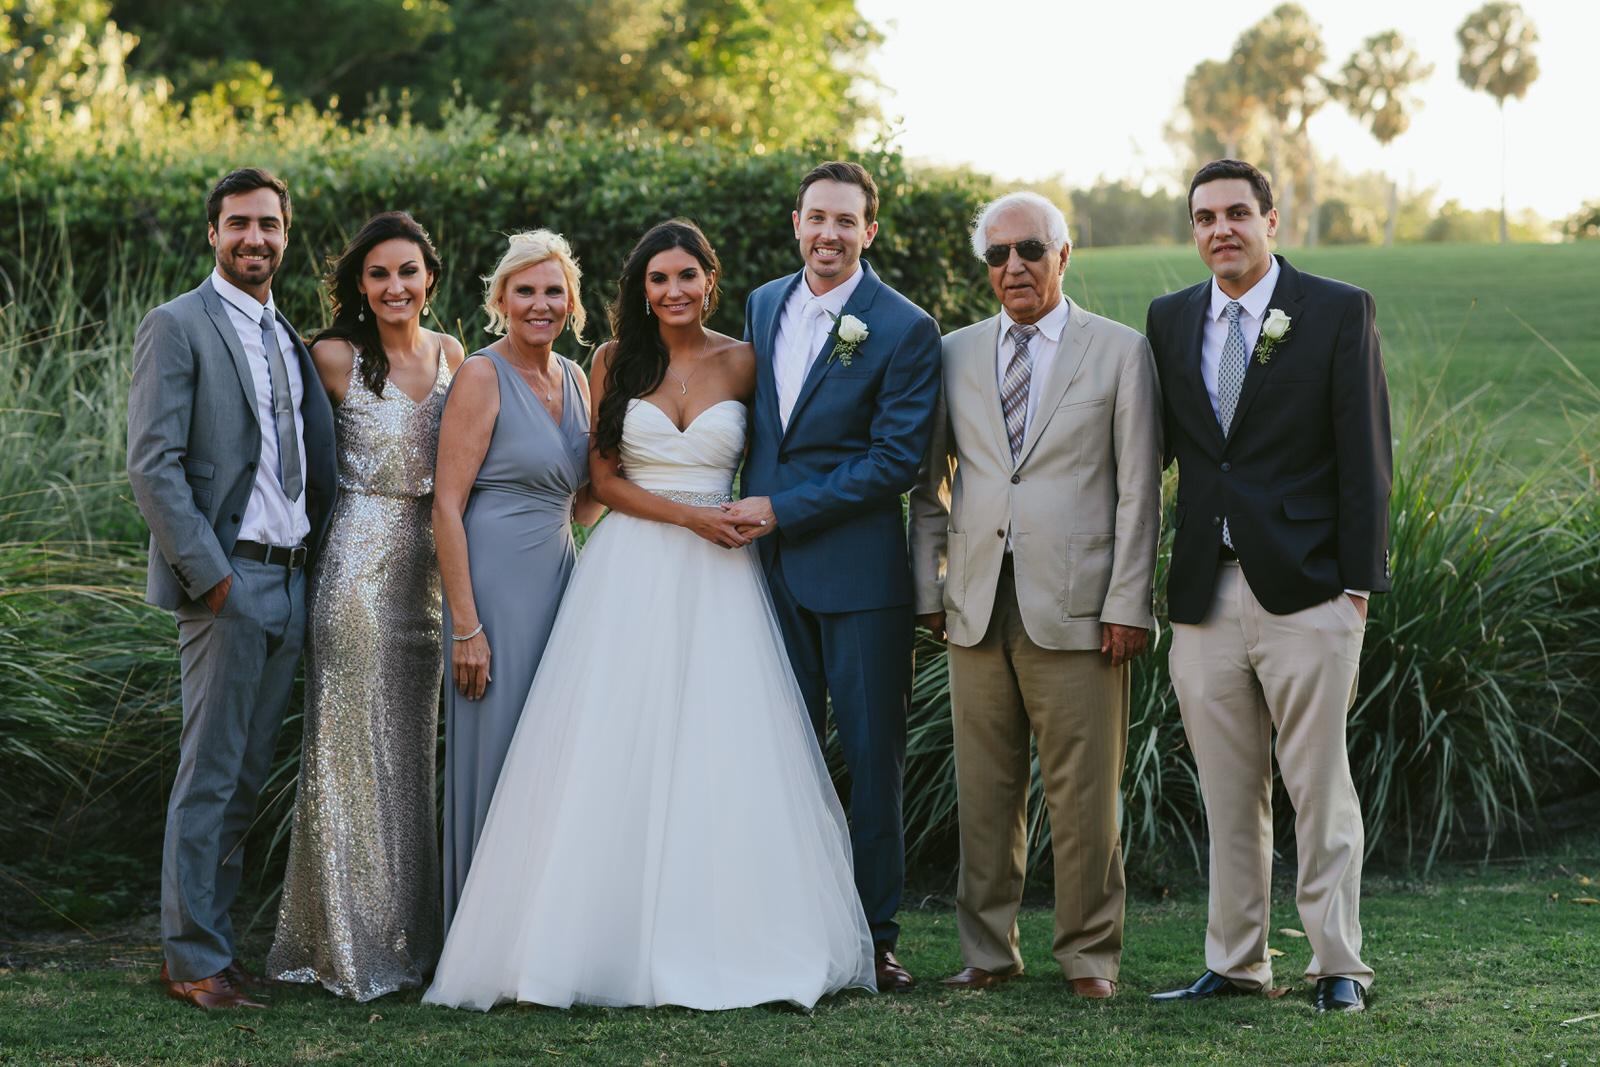 jensen_beach_wedding_family_formals-19.jpg